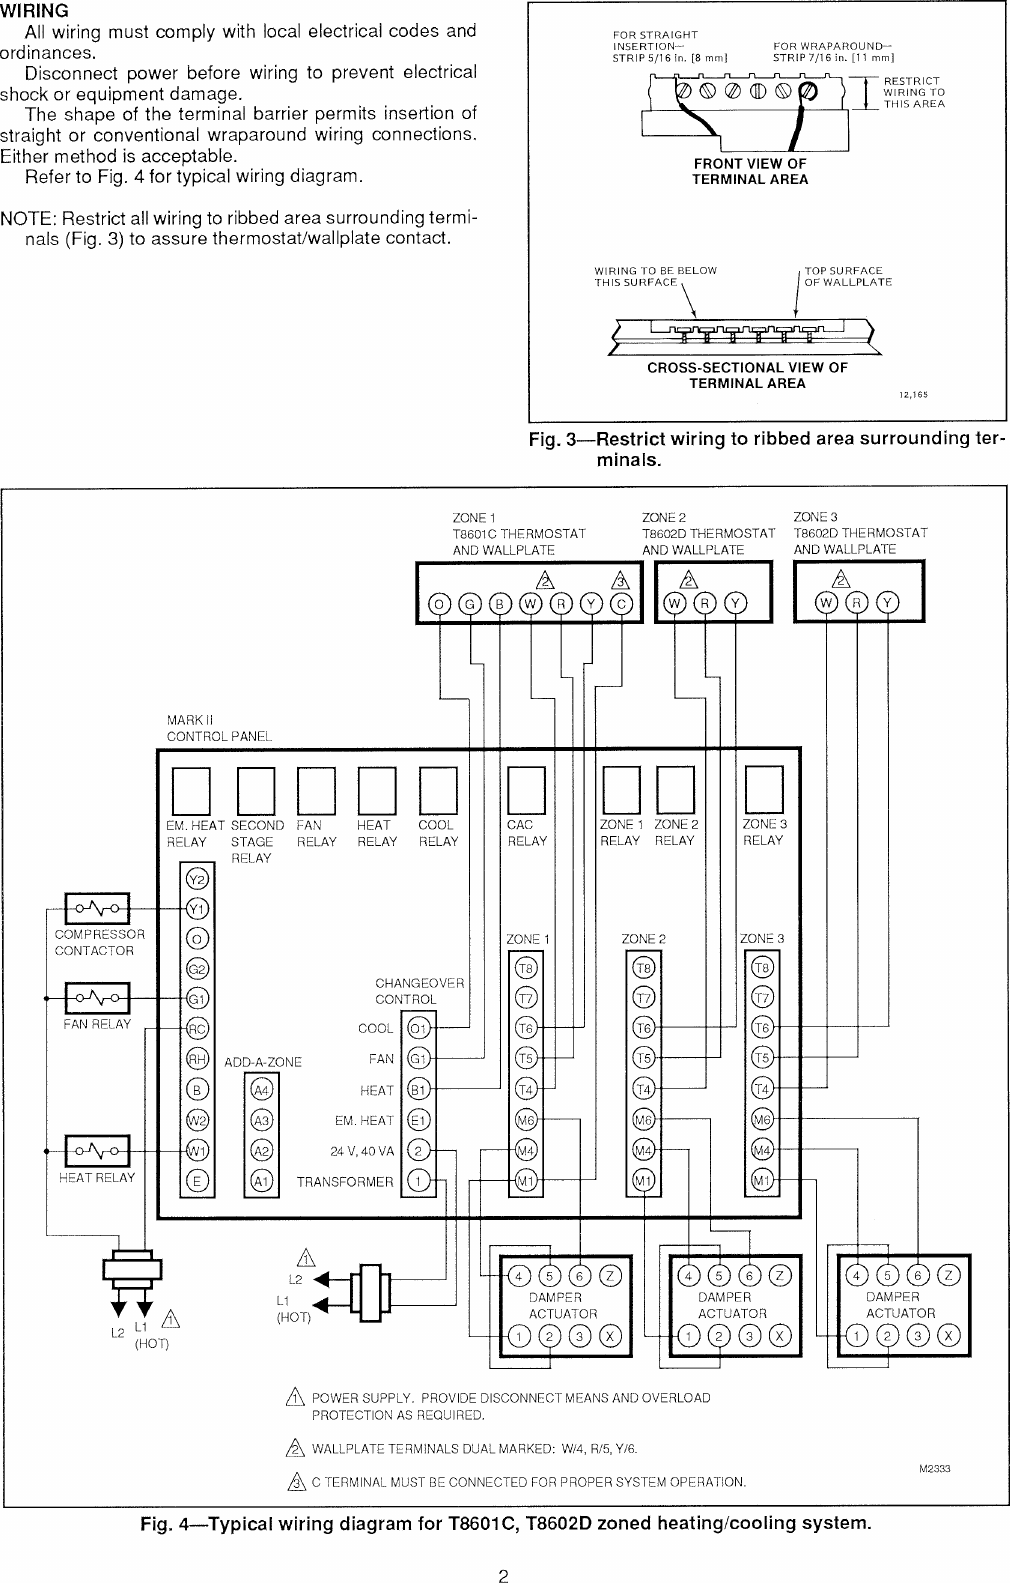 honeywell chronotherm 3 wiring diagram honeywell triple